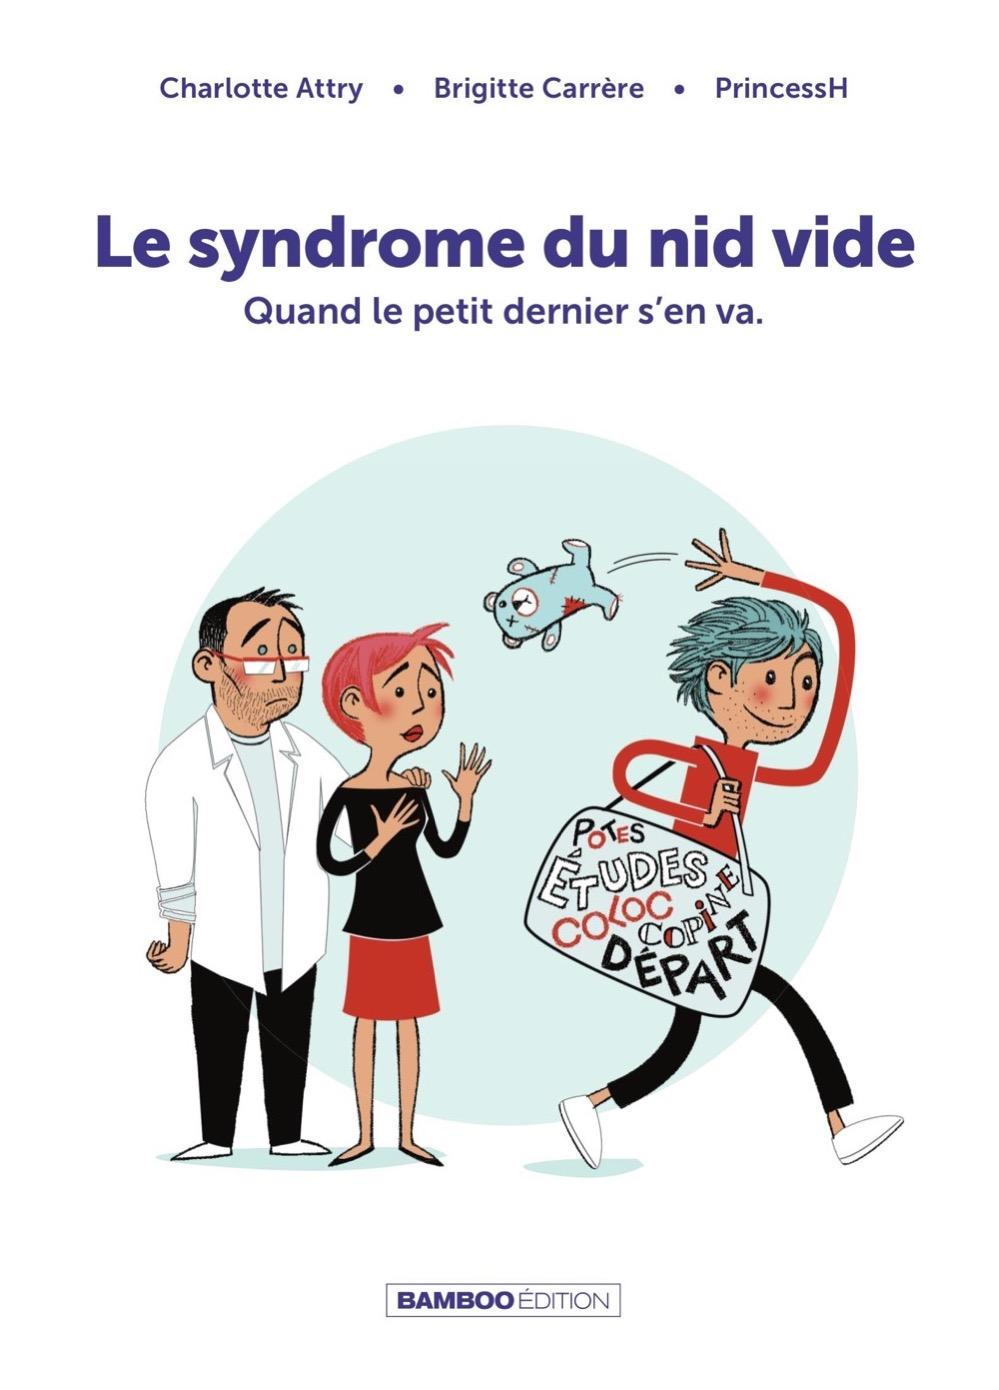 le syndrome du nid vide page 1